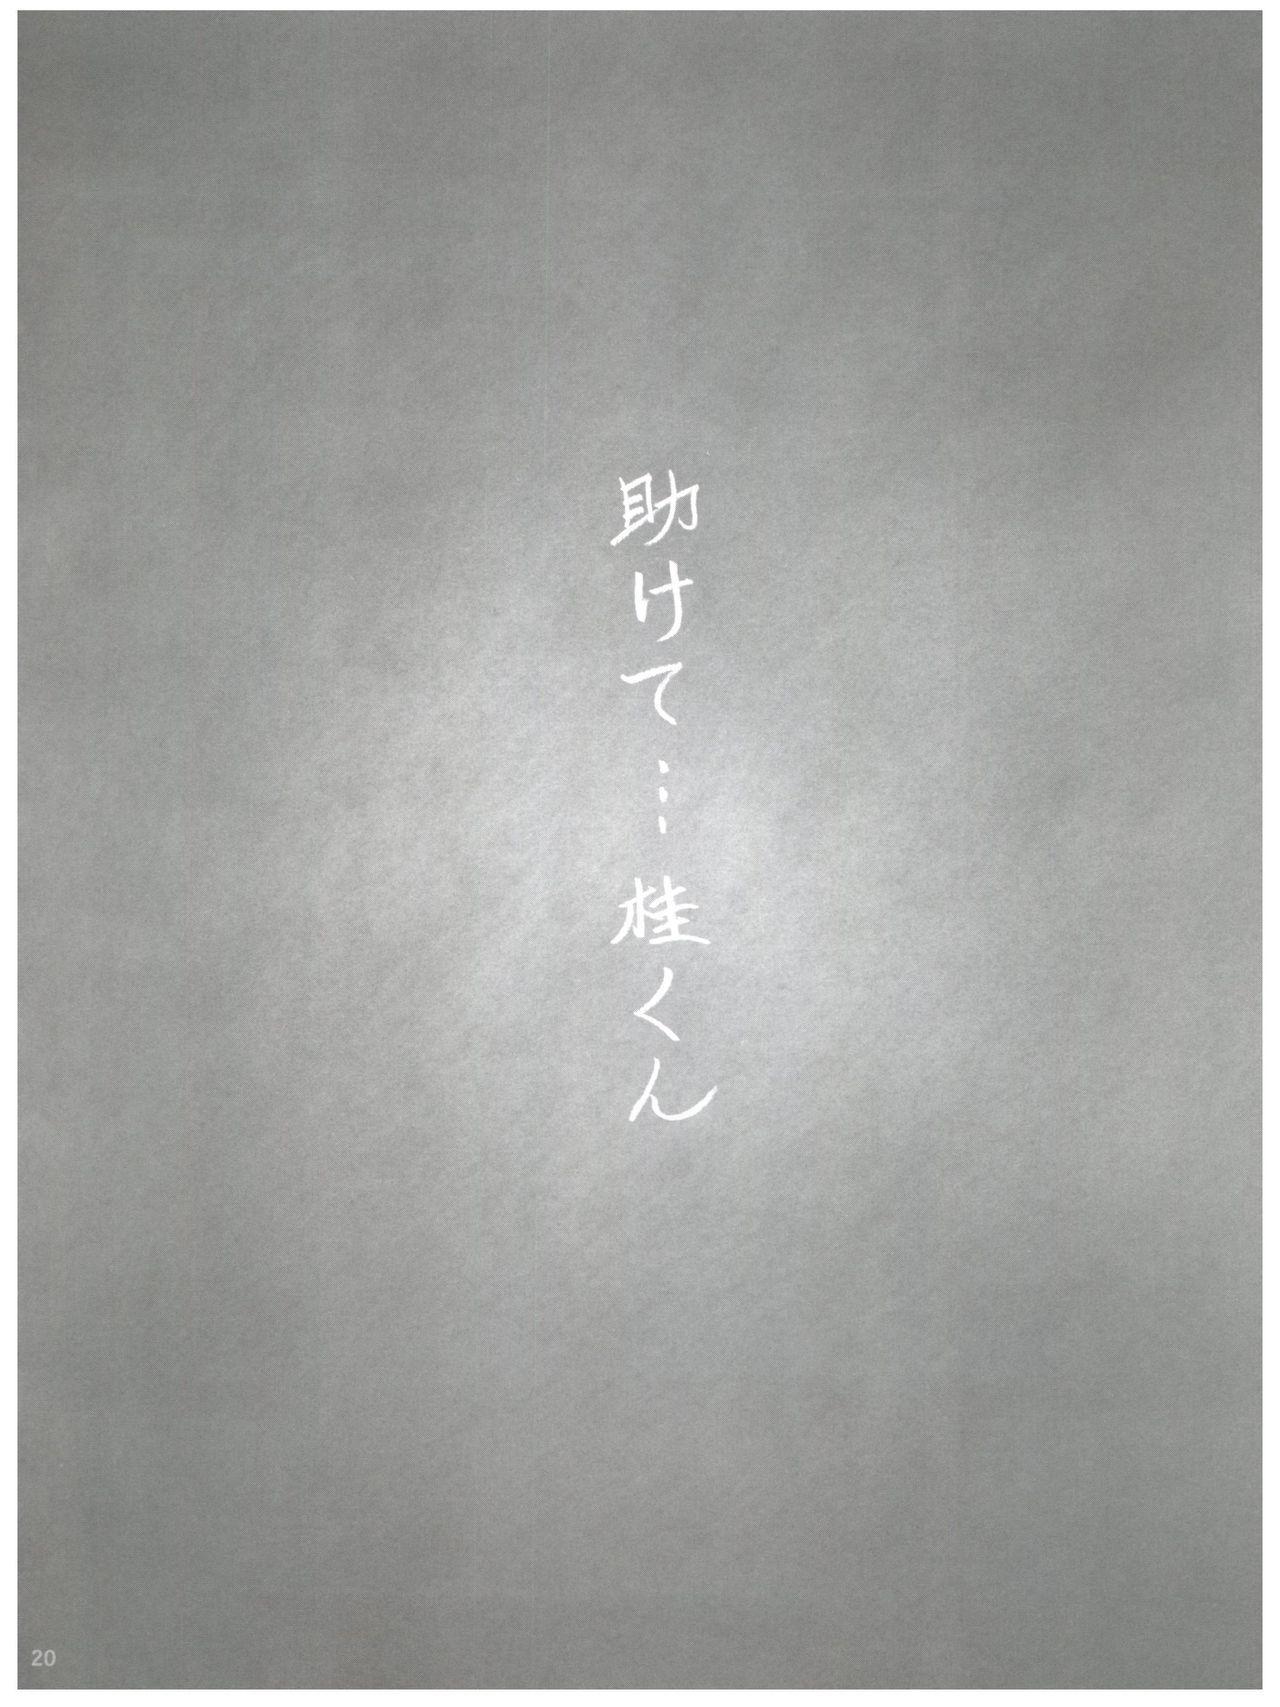 NONOYA Ryoujoku Sakuhinshuu 1 20